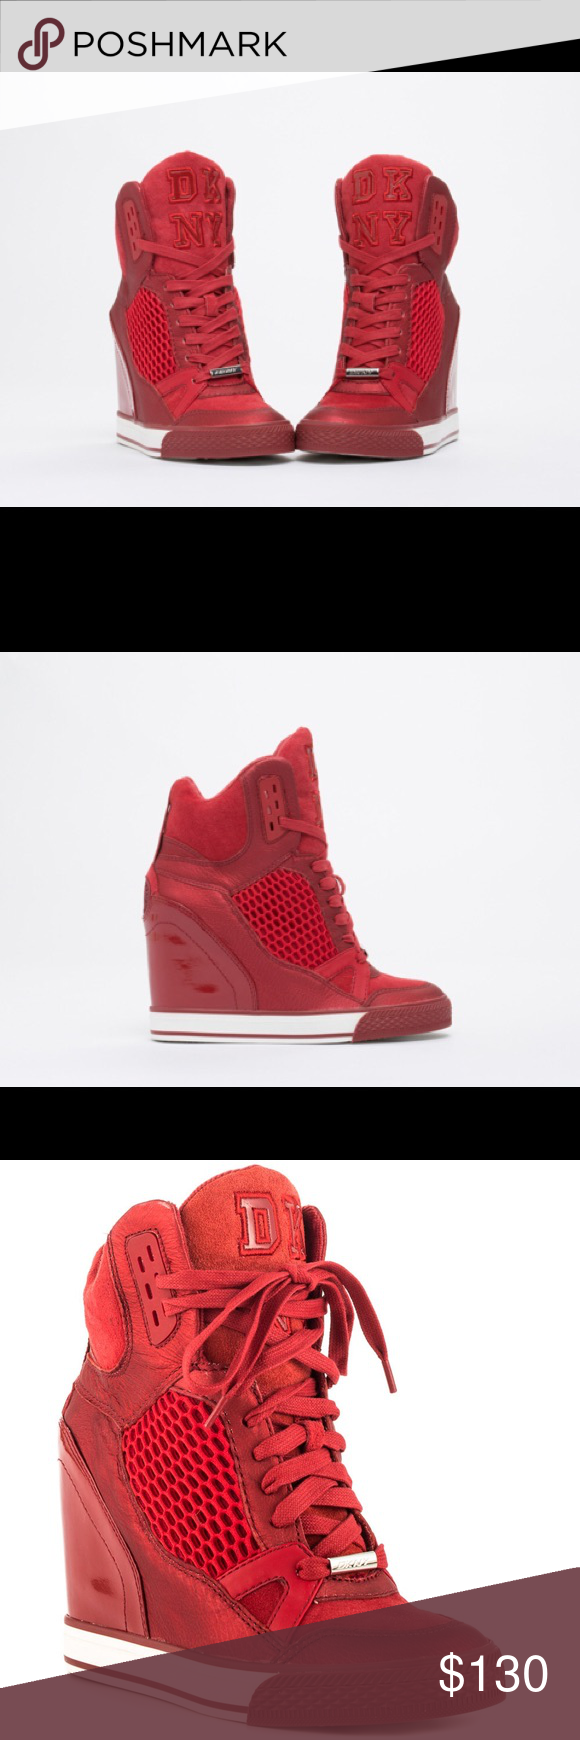 72a9269b4af DKNY Giada sneaker wedge in Cardinal Red US women s 8